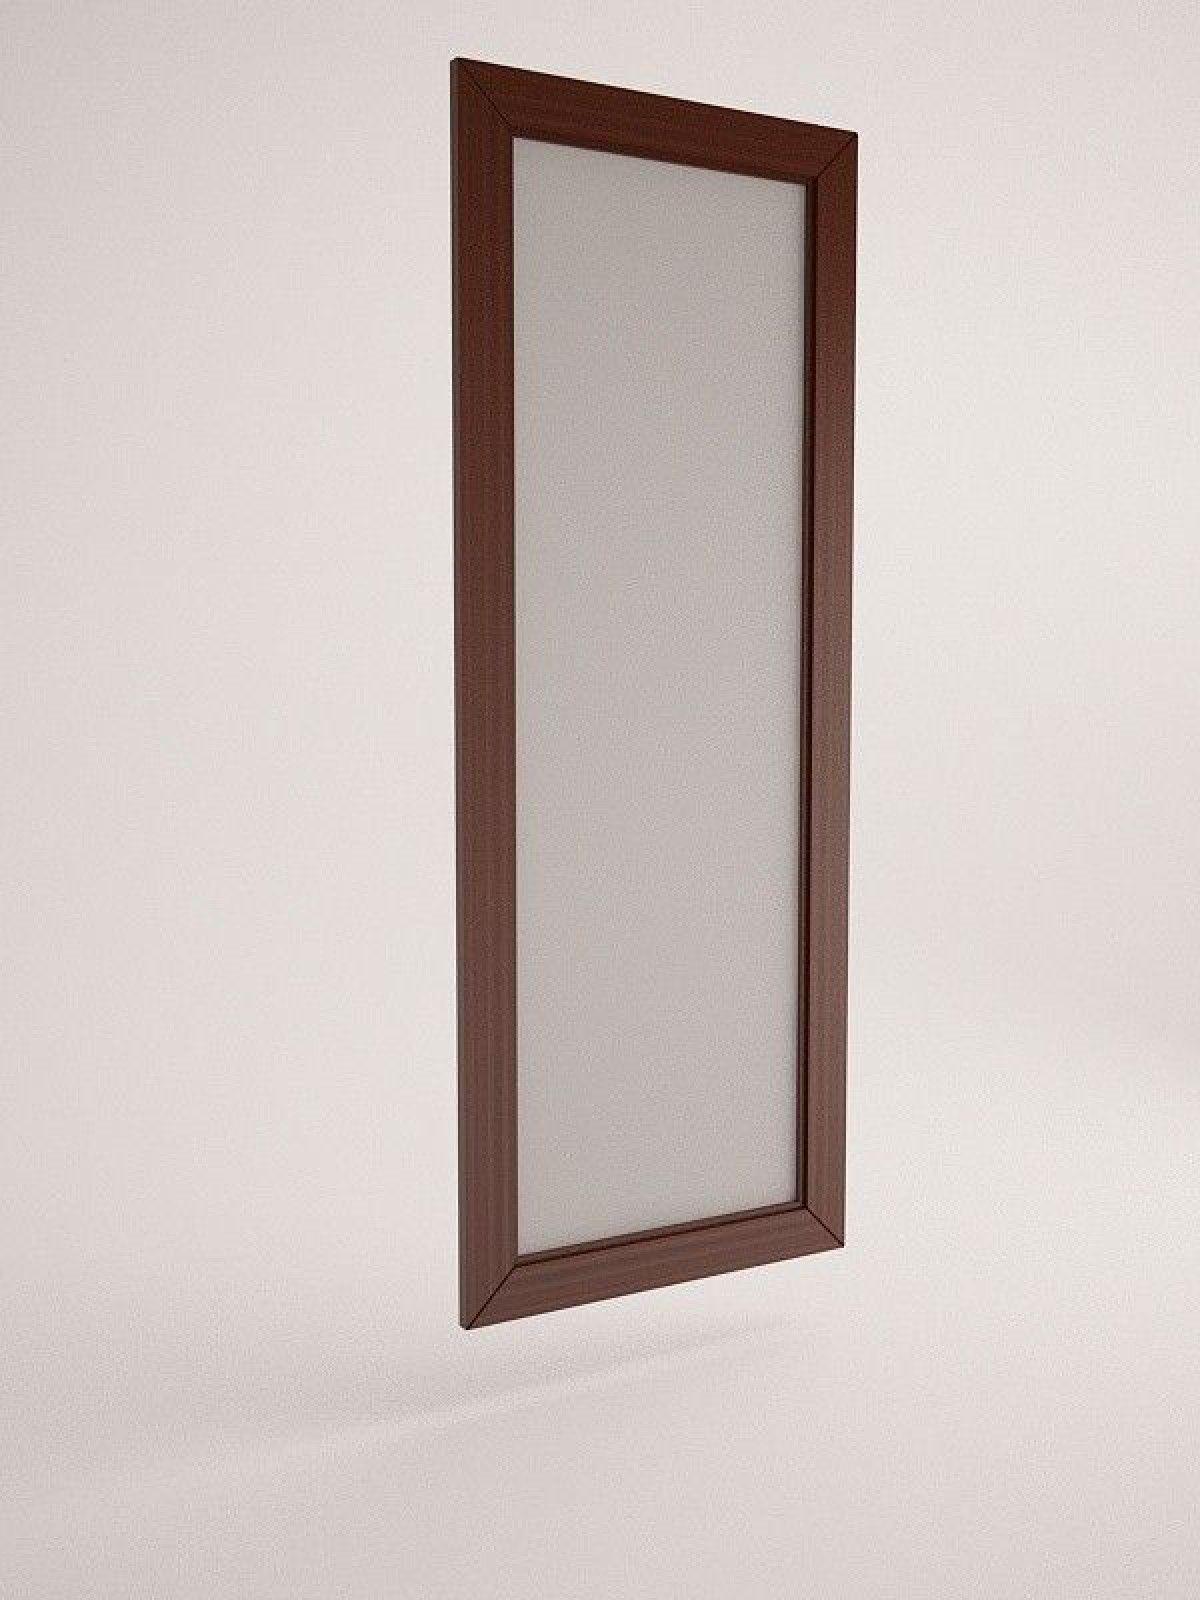 Marco espejo vestidor Lucena